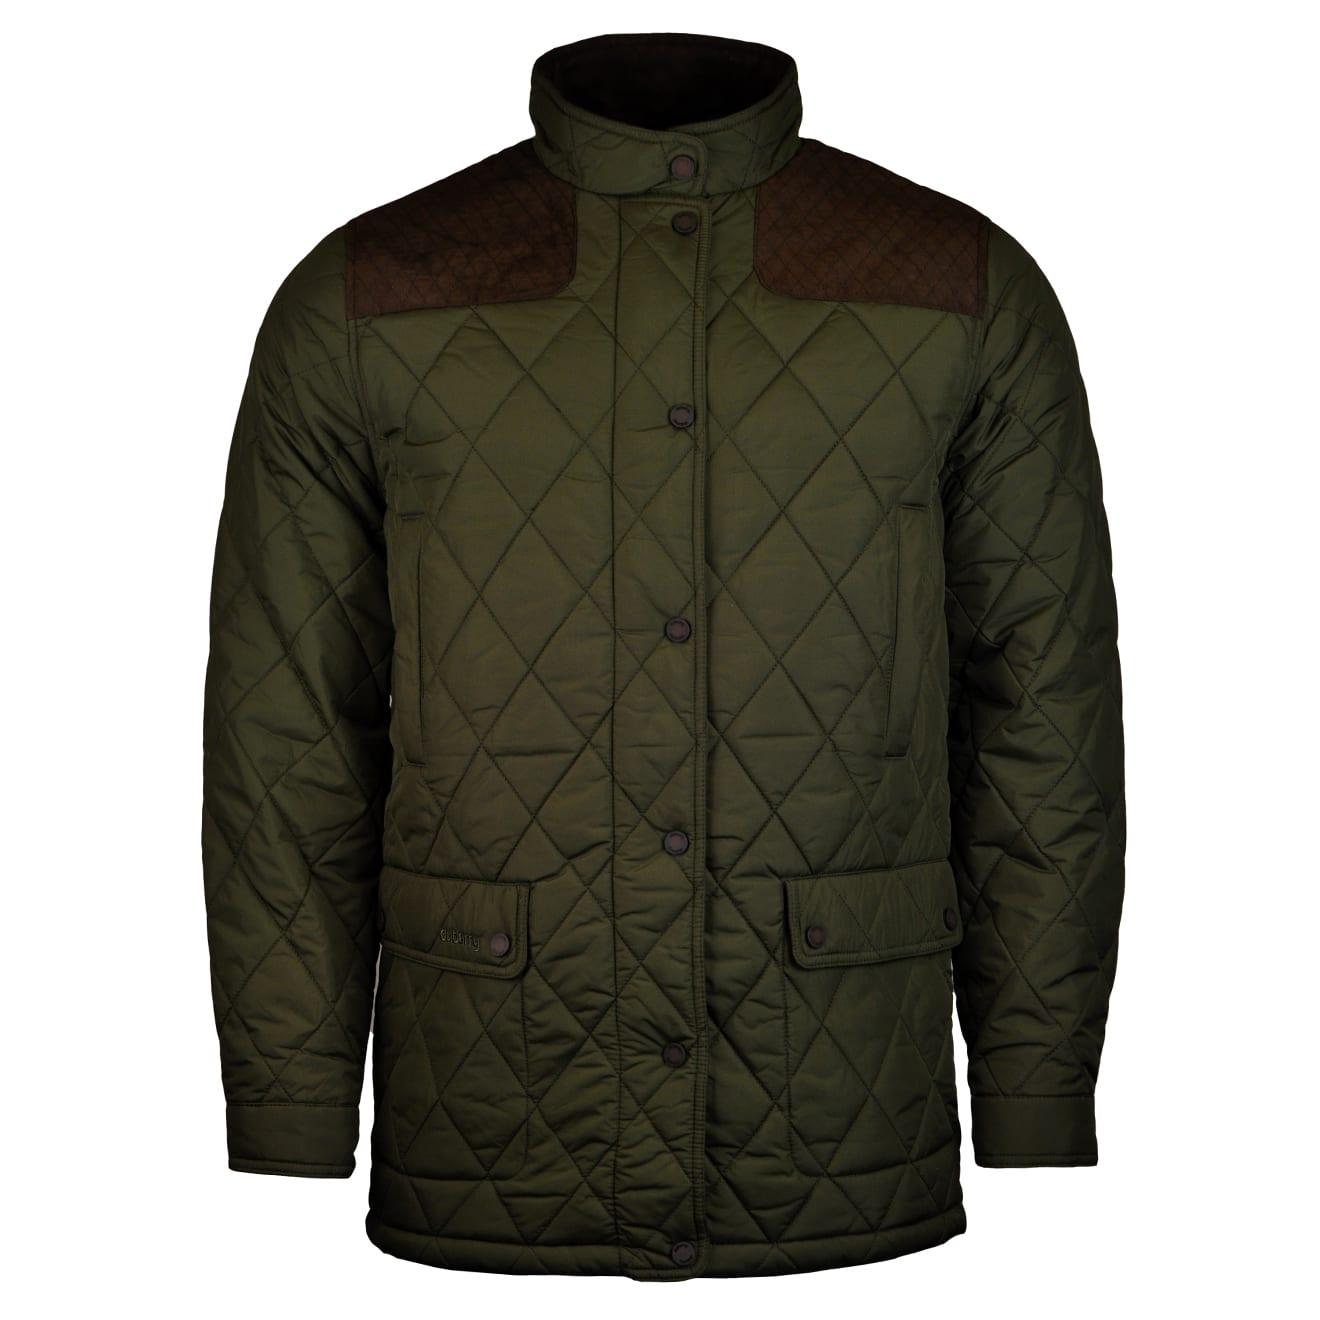 Dubarry Castlemartyr jacket olive